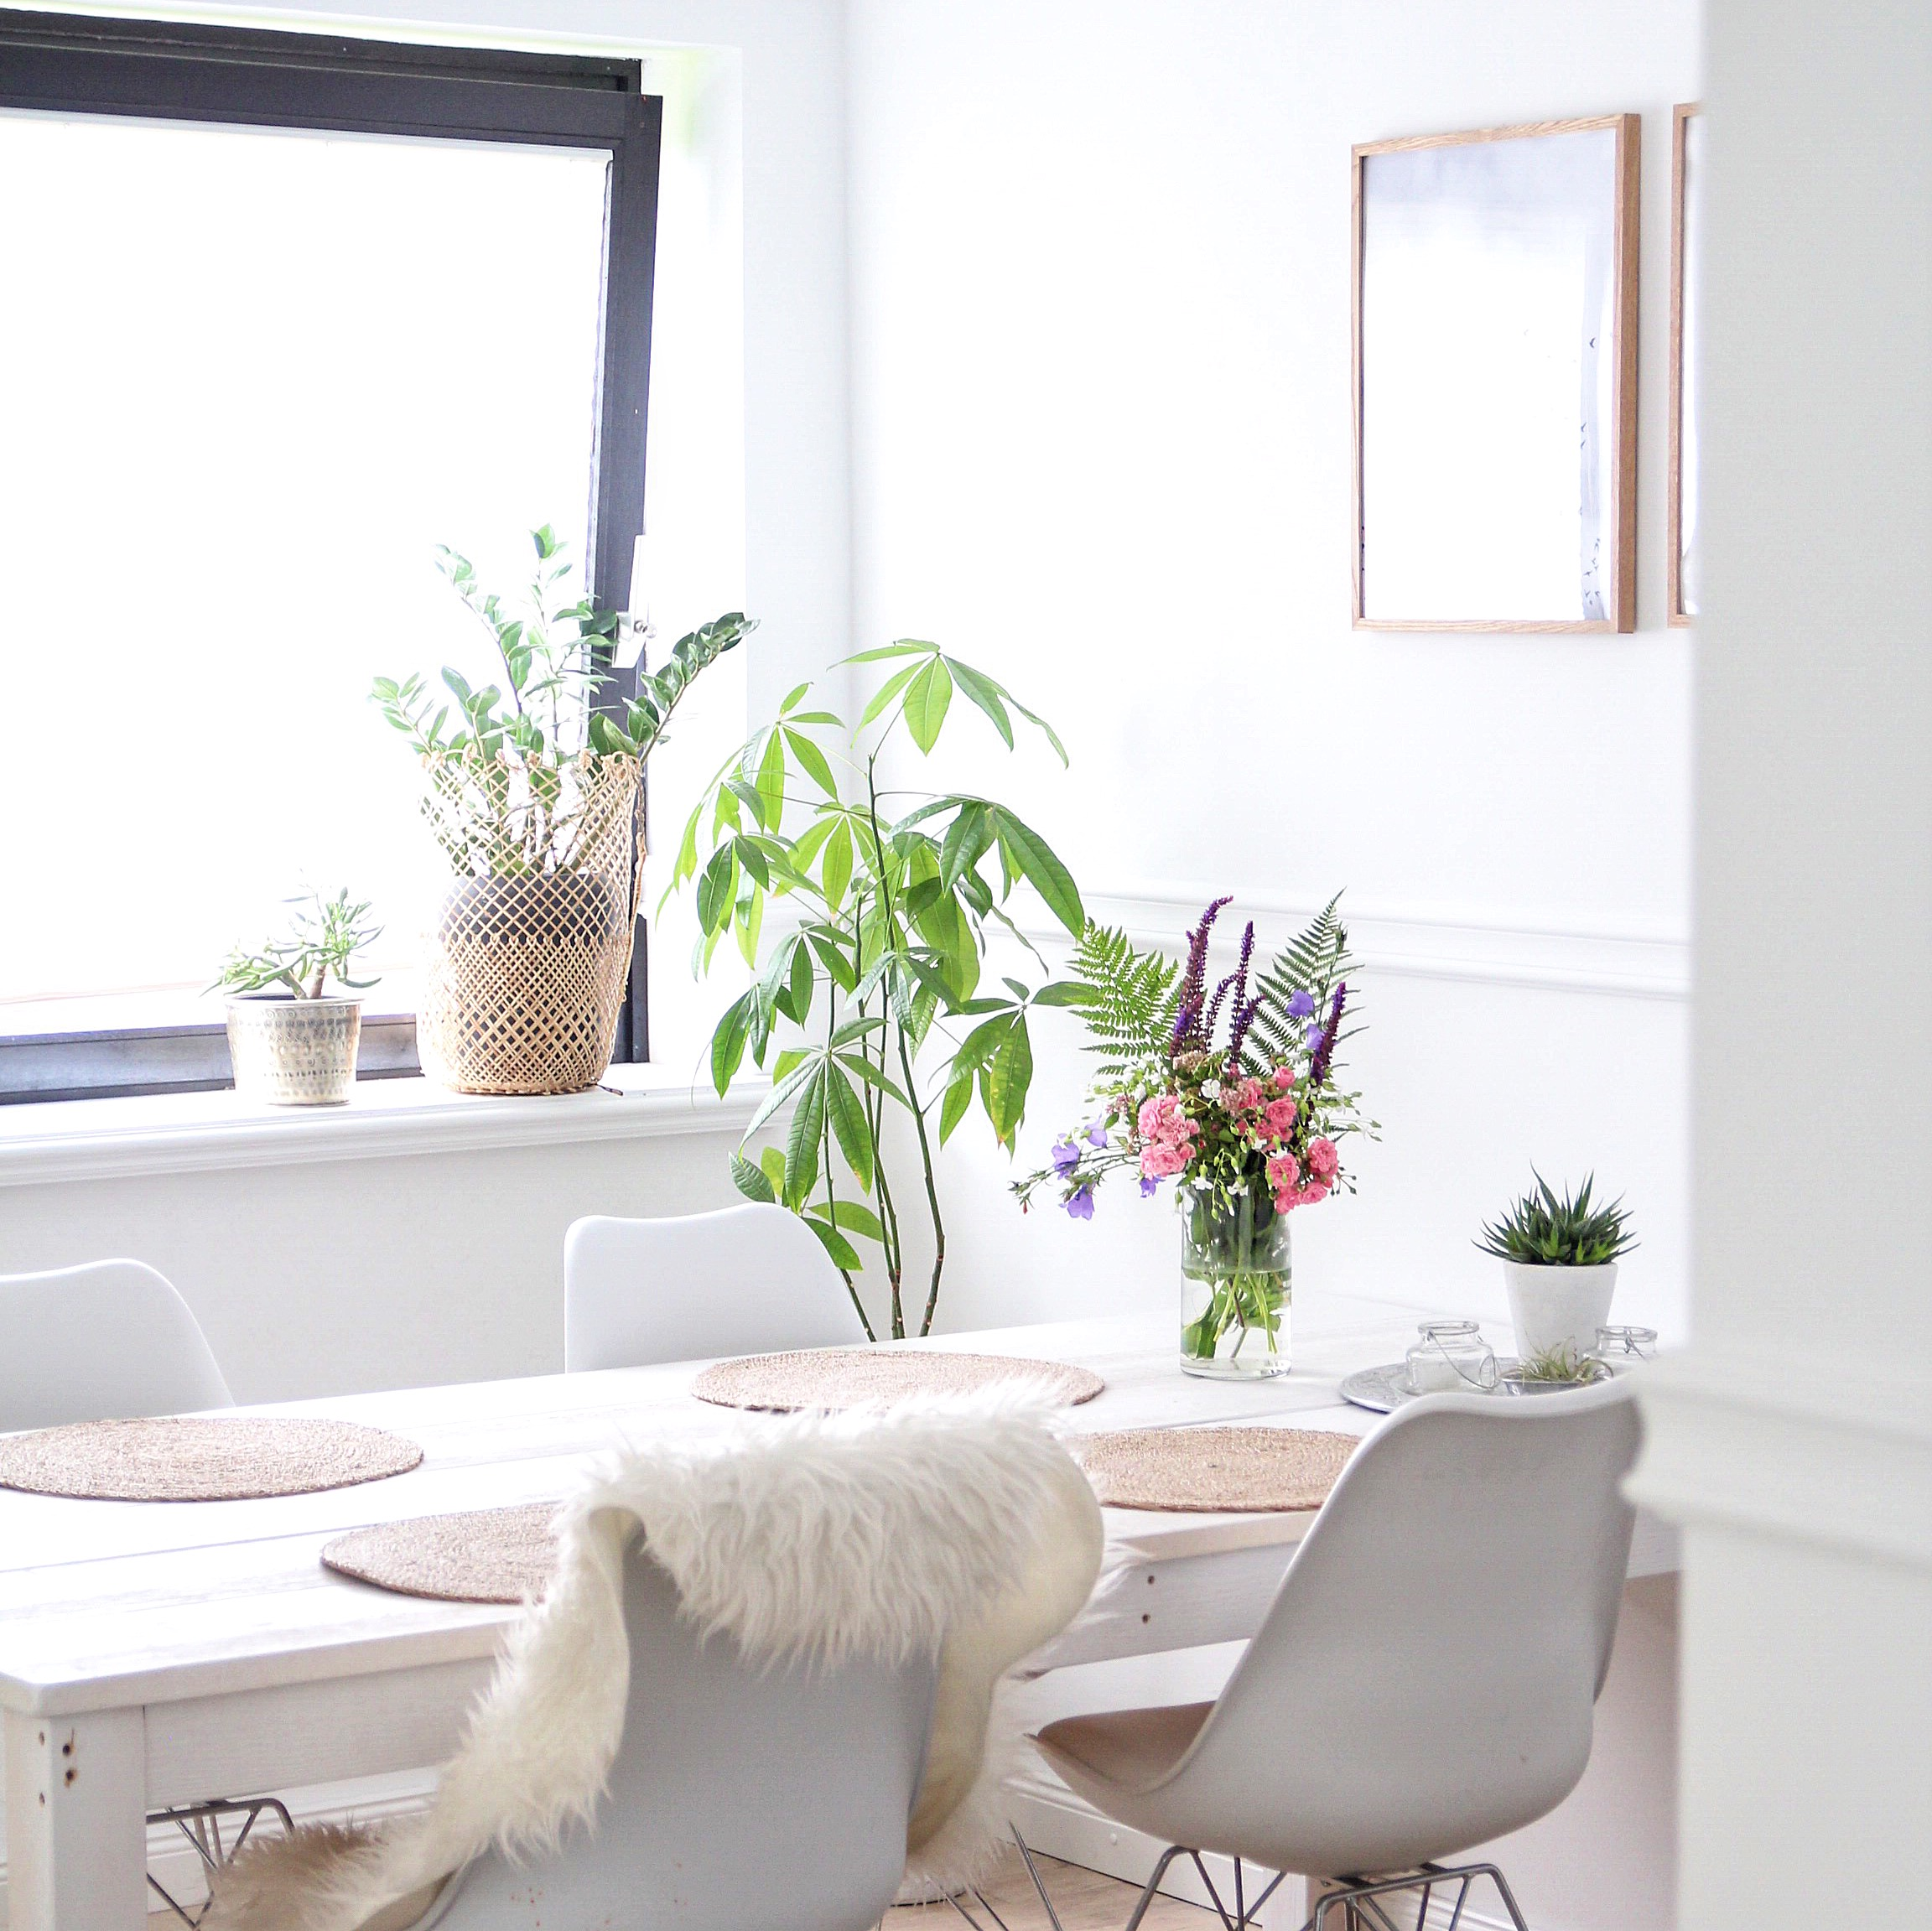 Grossen Tisch Selber Bauen Rustikal Design Dots